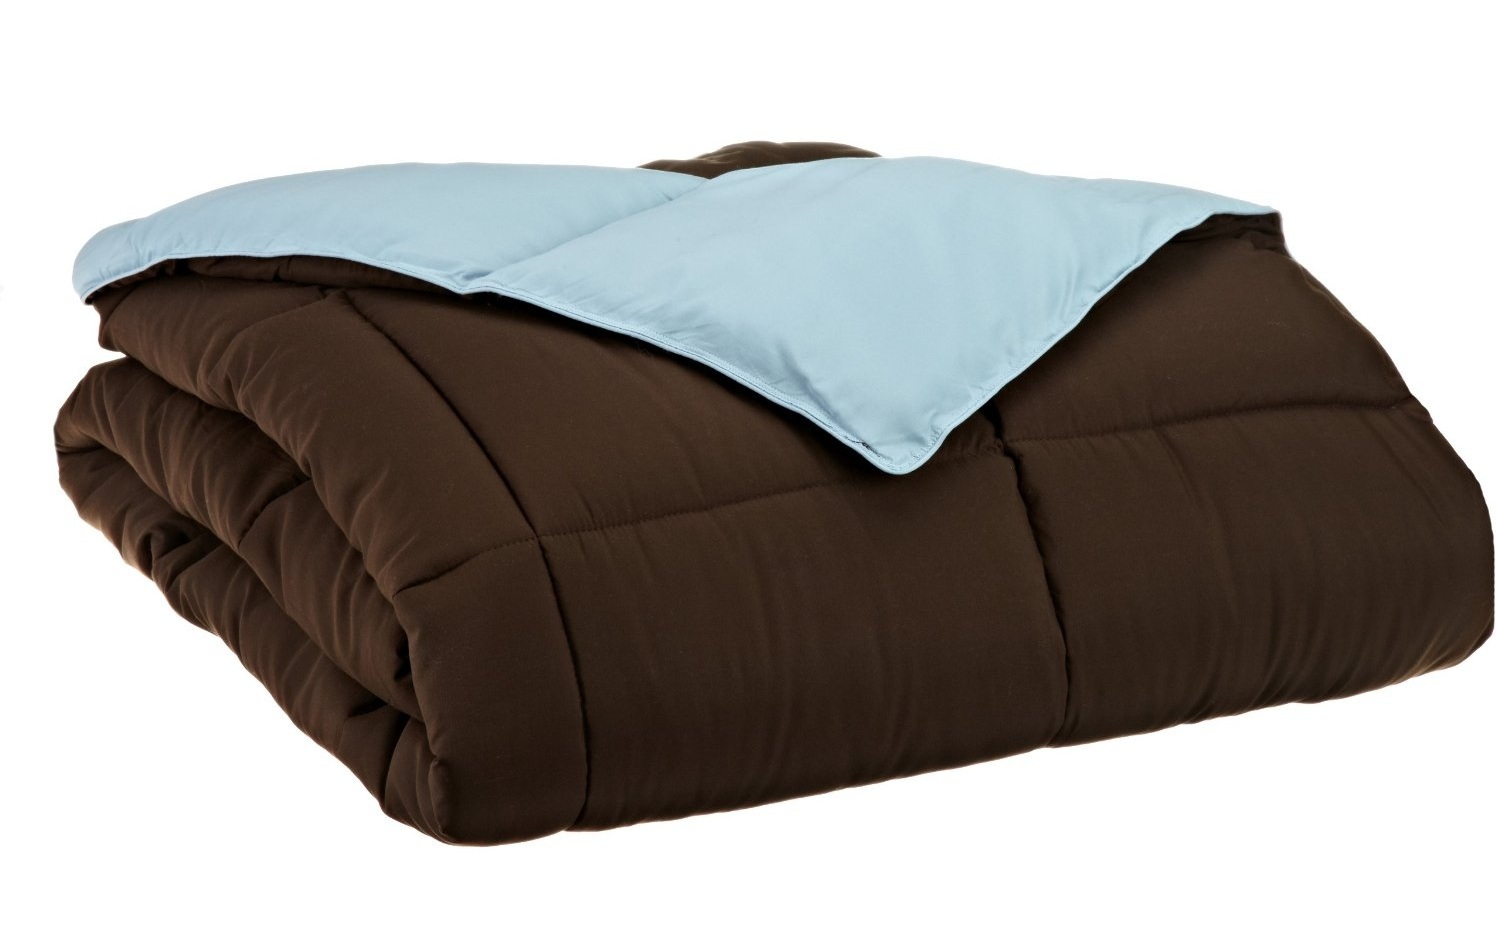 Reversible-All-season-Down-Alternative-Comforter-7-Fashionable-Colors thumbnail 5